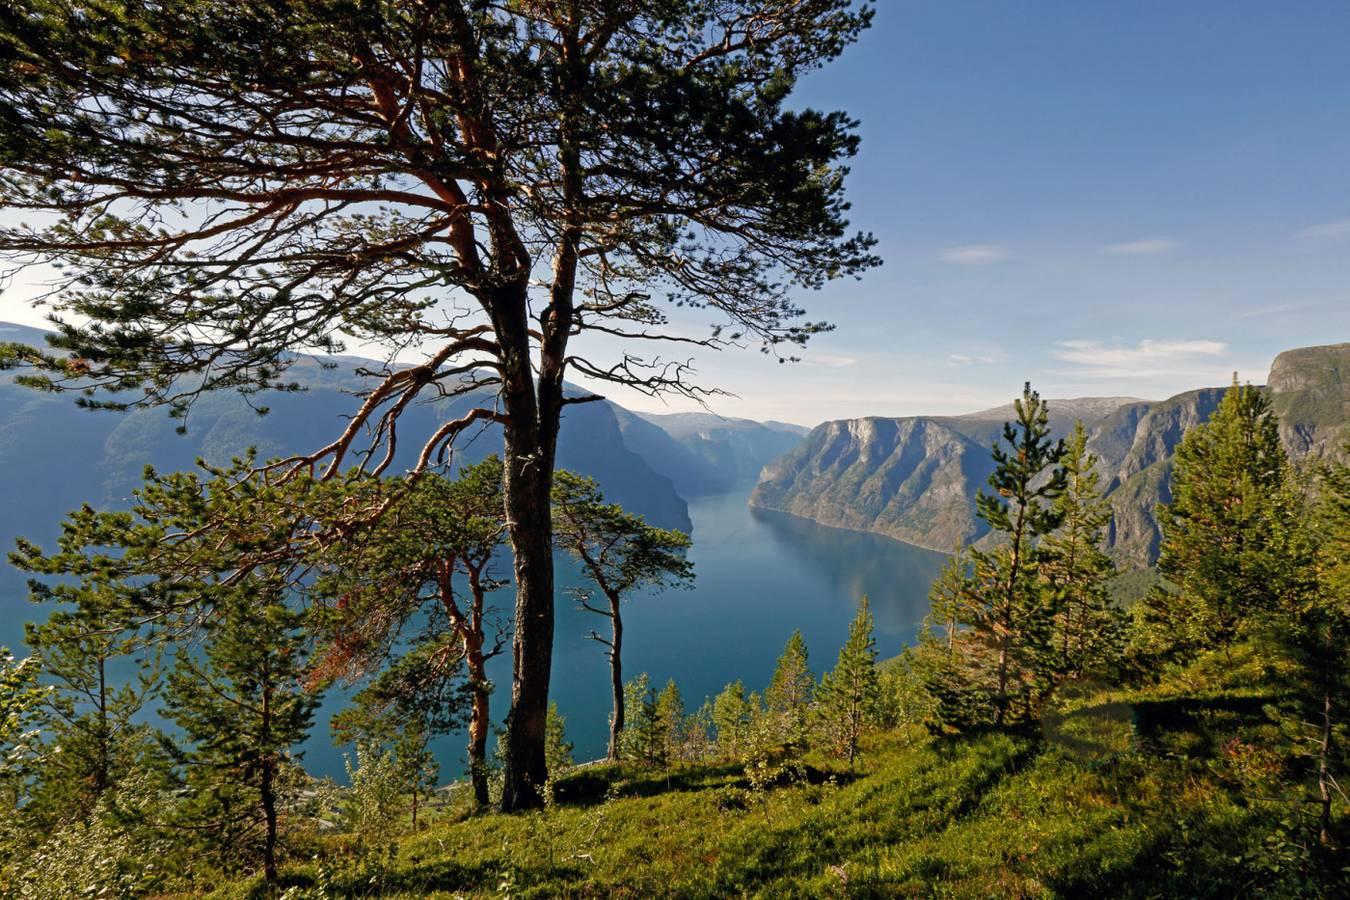 Ausblick auf den Aurlandsfjord, Norwegen (© Corrado Filipponi)